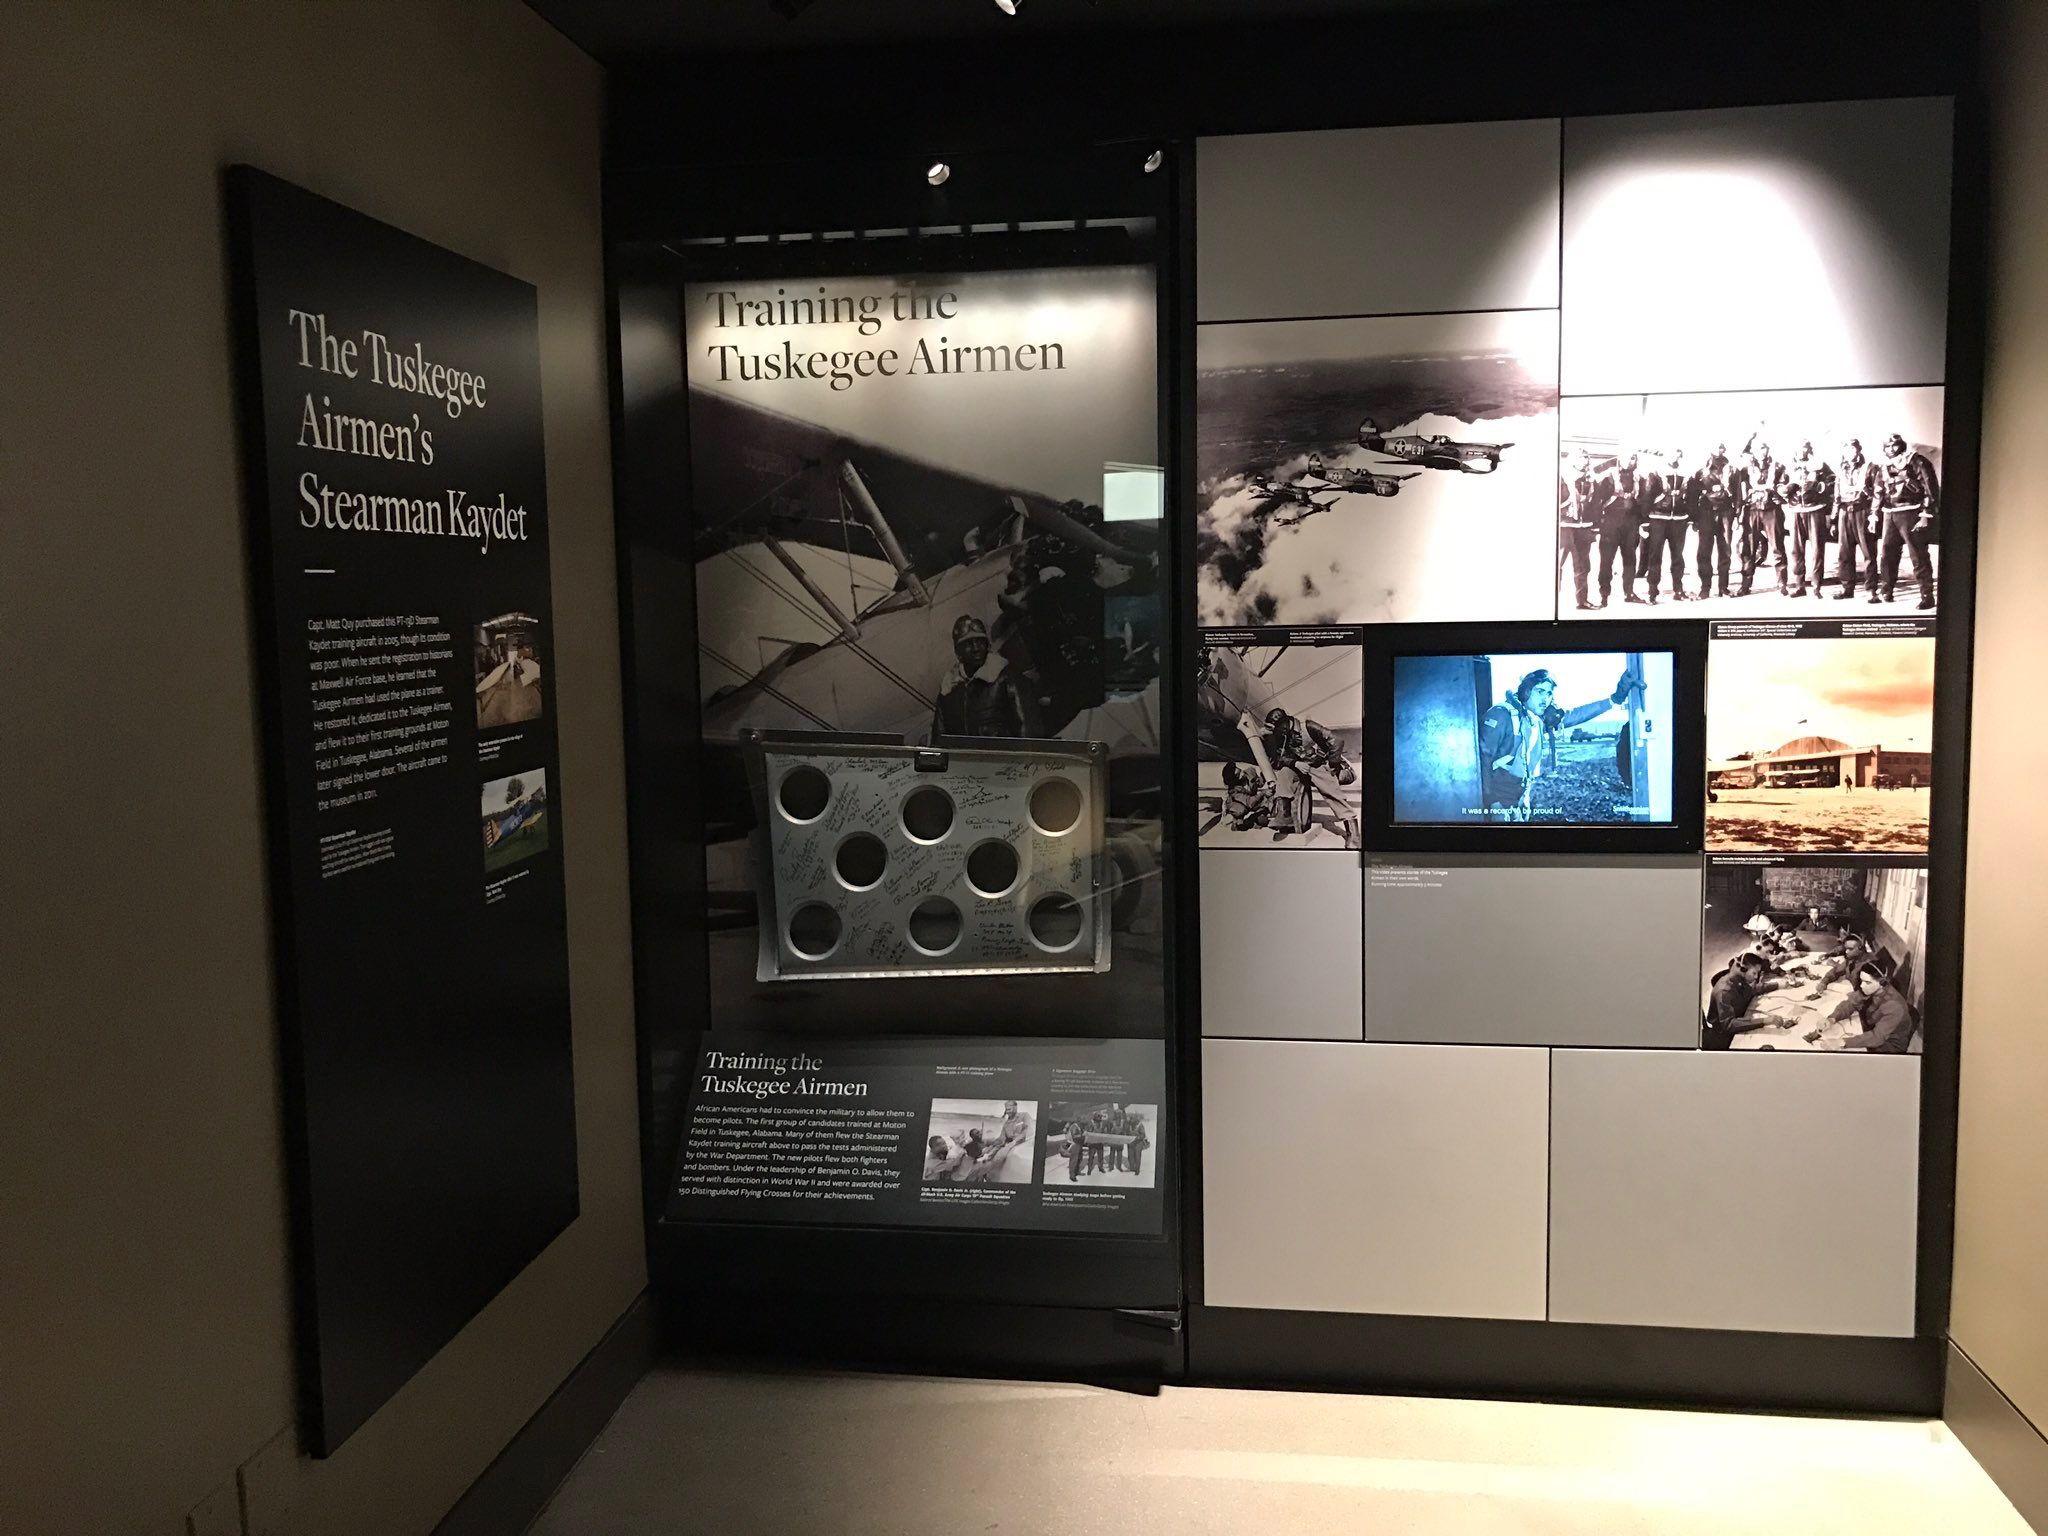 tuskegee airmen essay tuskegee airmen nat l historic site part the  nmaahc exhibit tuskegee airmen